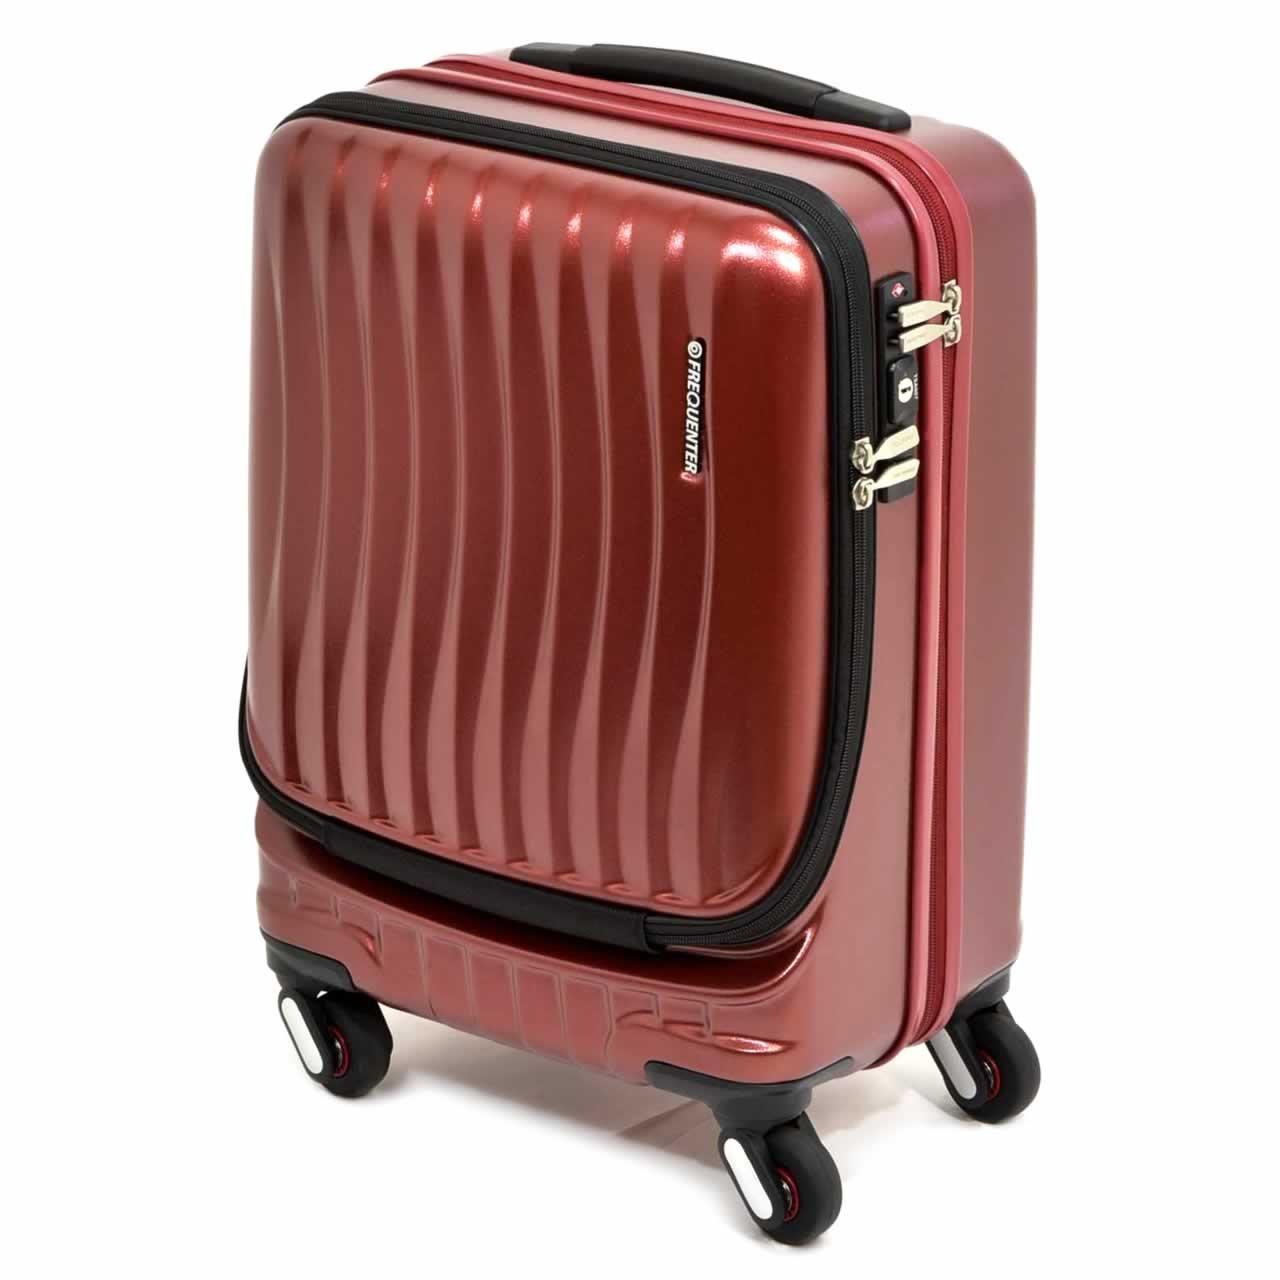 [FREQUENTER(フリクエンター)] スーツケース CLAM ADVANCE クラムアドバンス 46cm 34L 3.6kg 機内持ち込み 1-216  ワイン B07DR9QJ2T